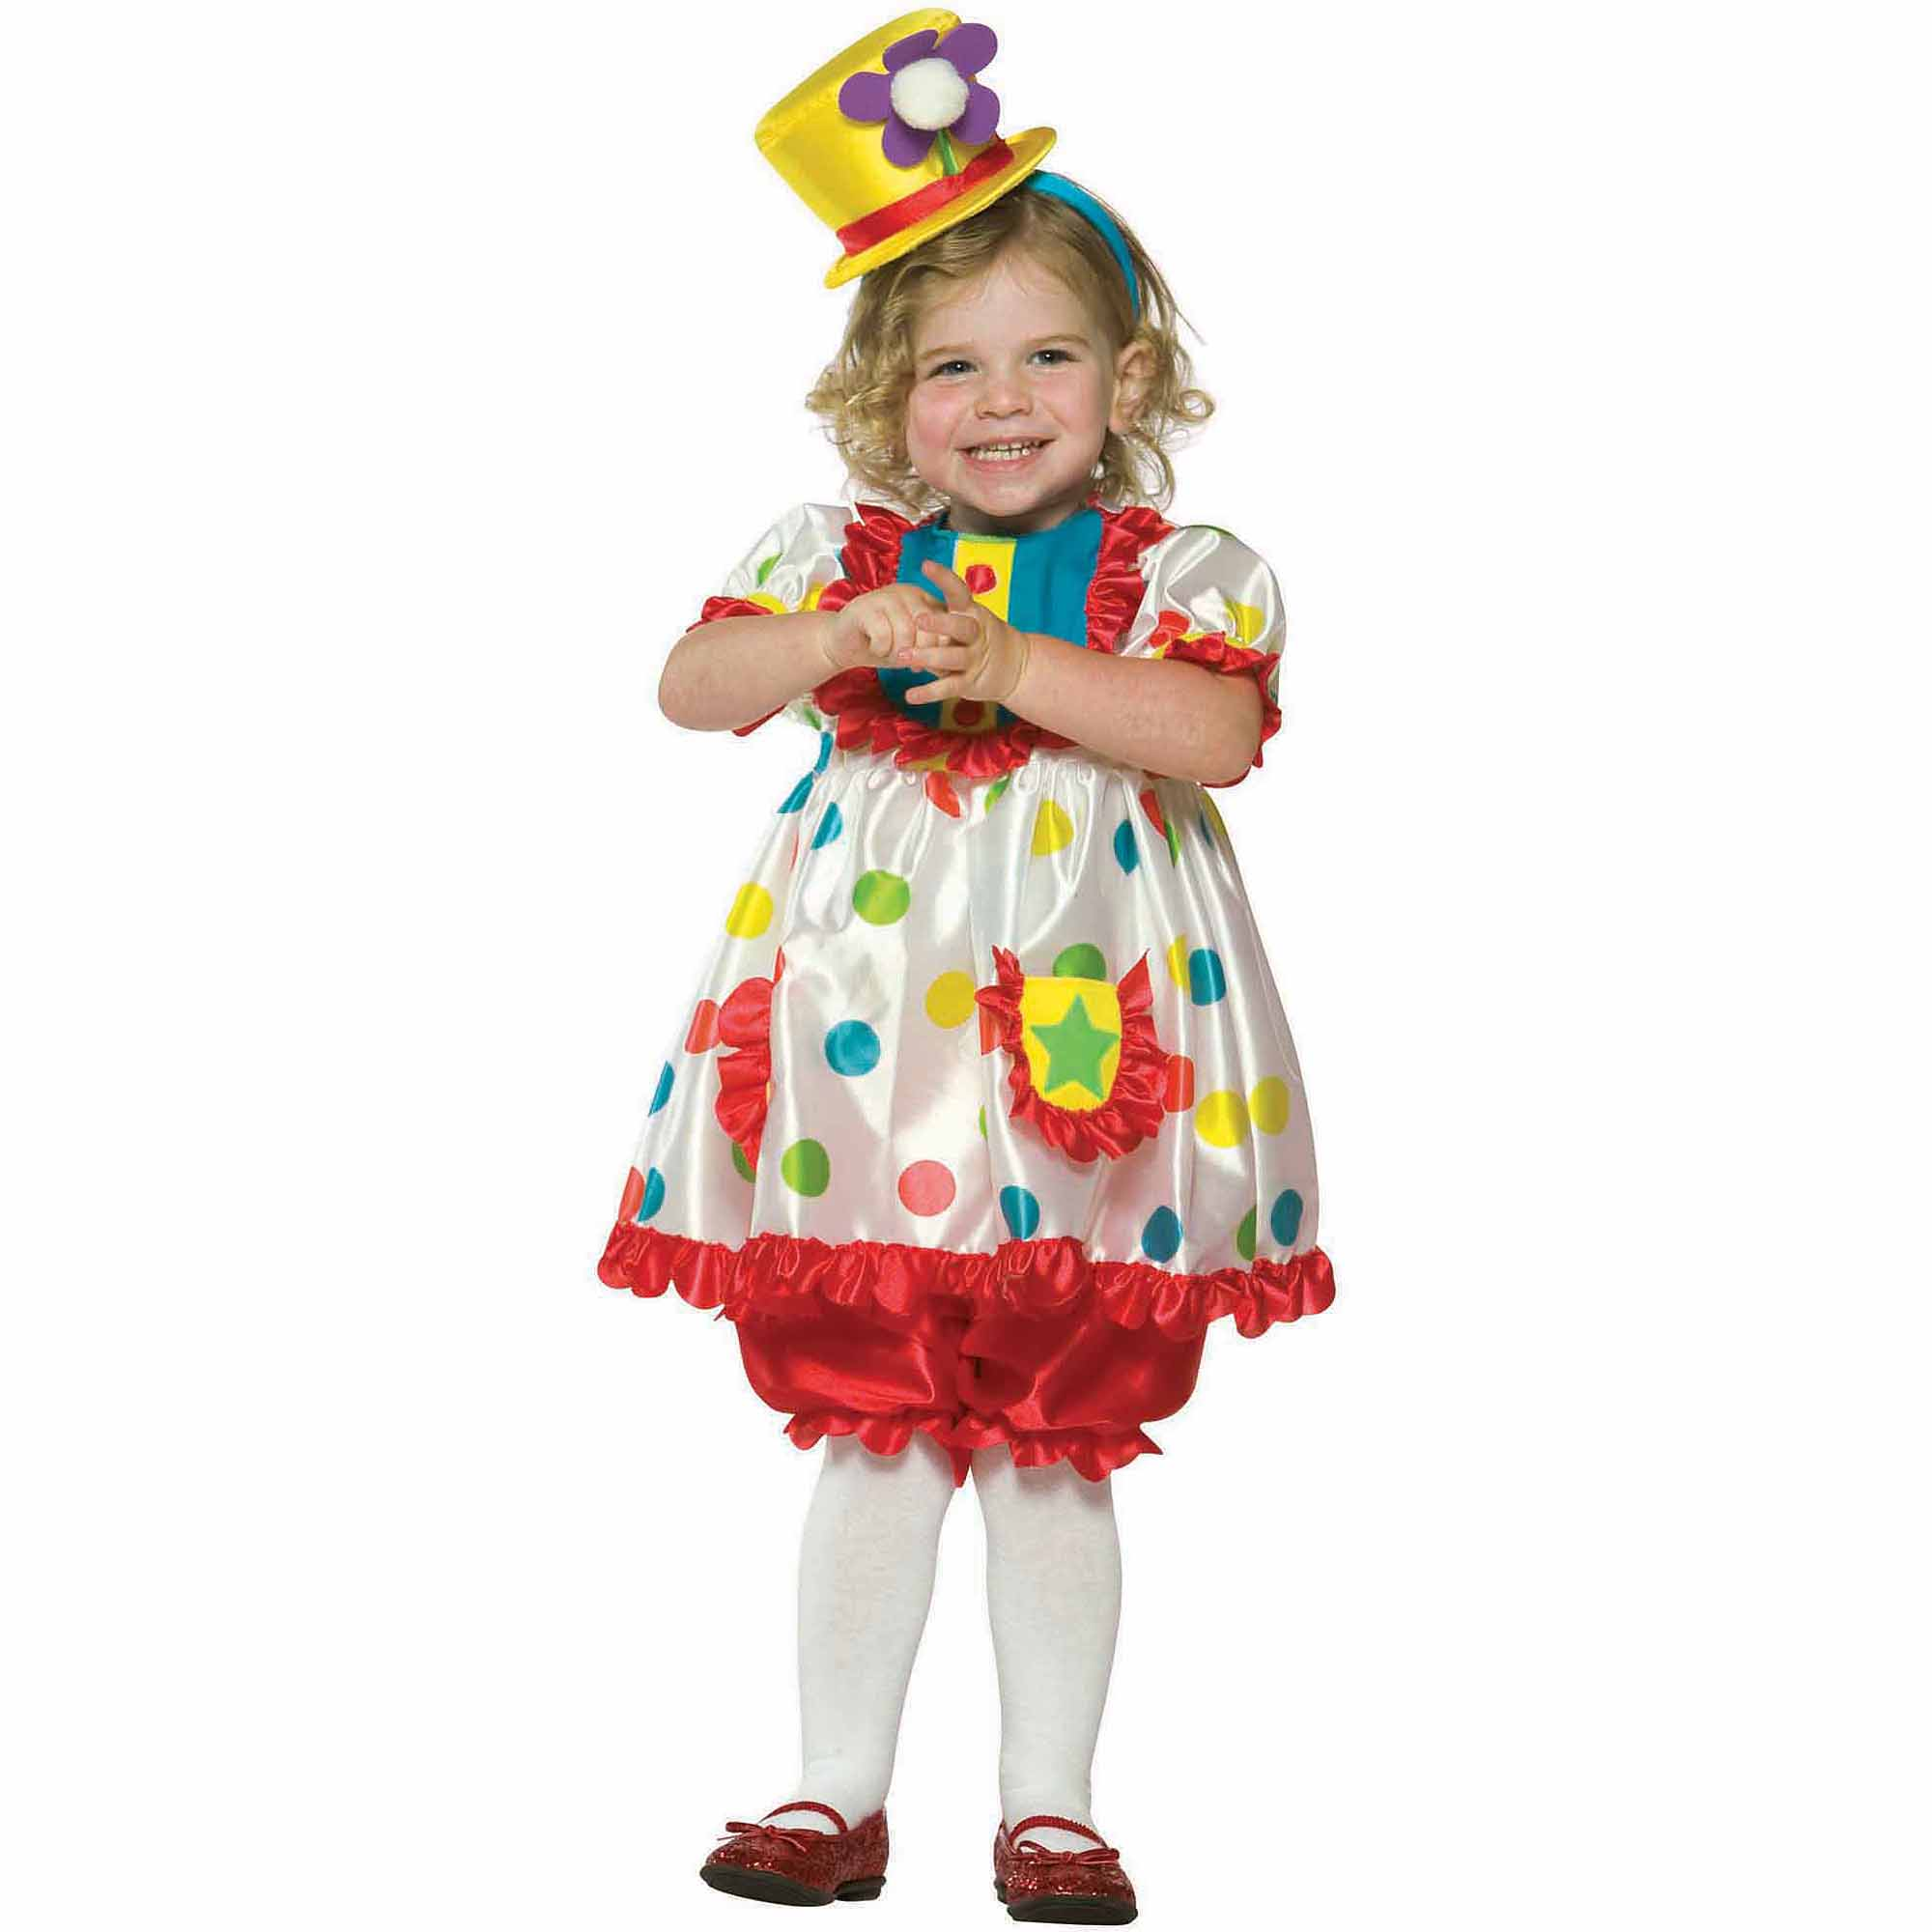 Clown Girl Toddler Halloween Costume